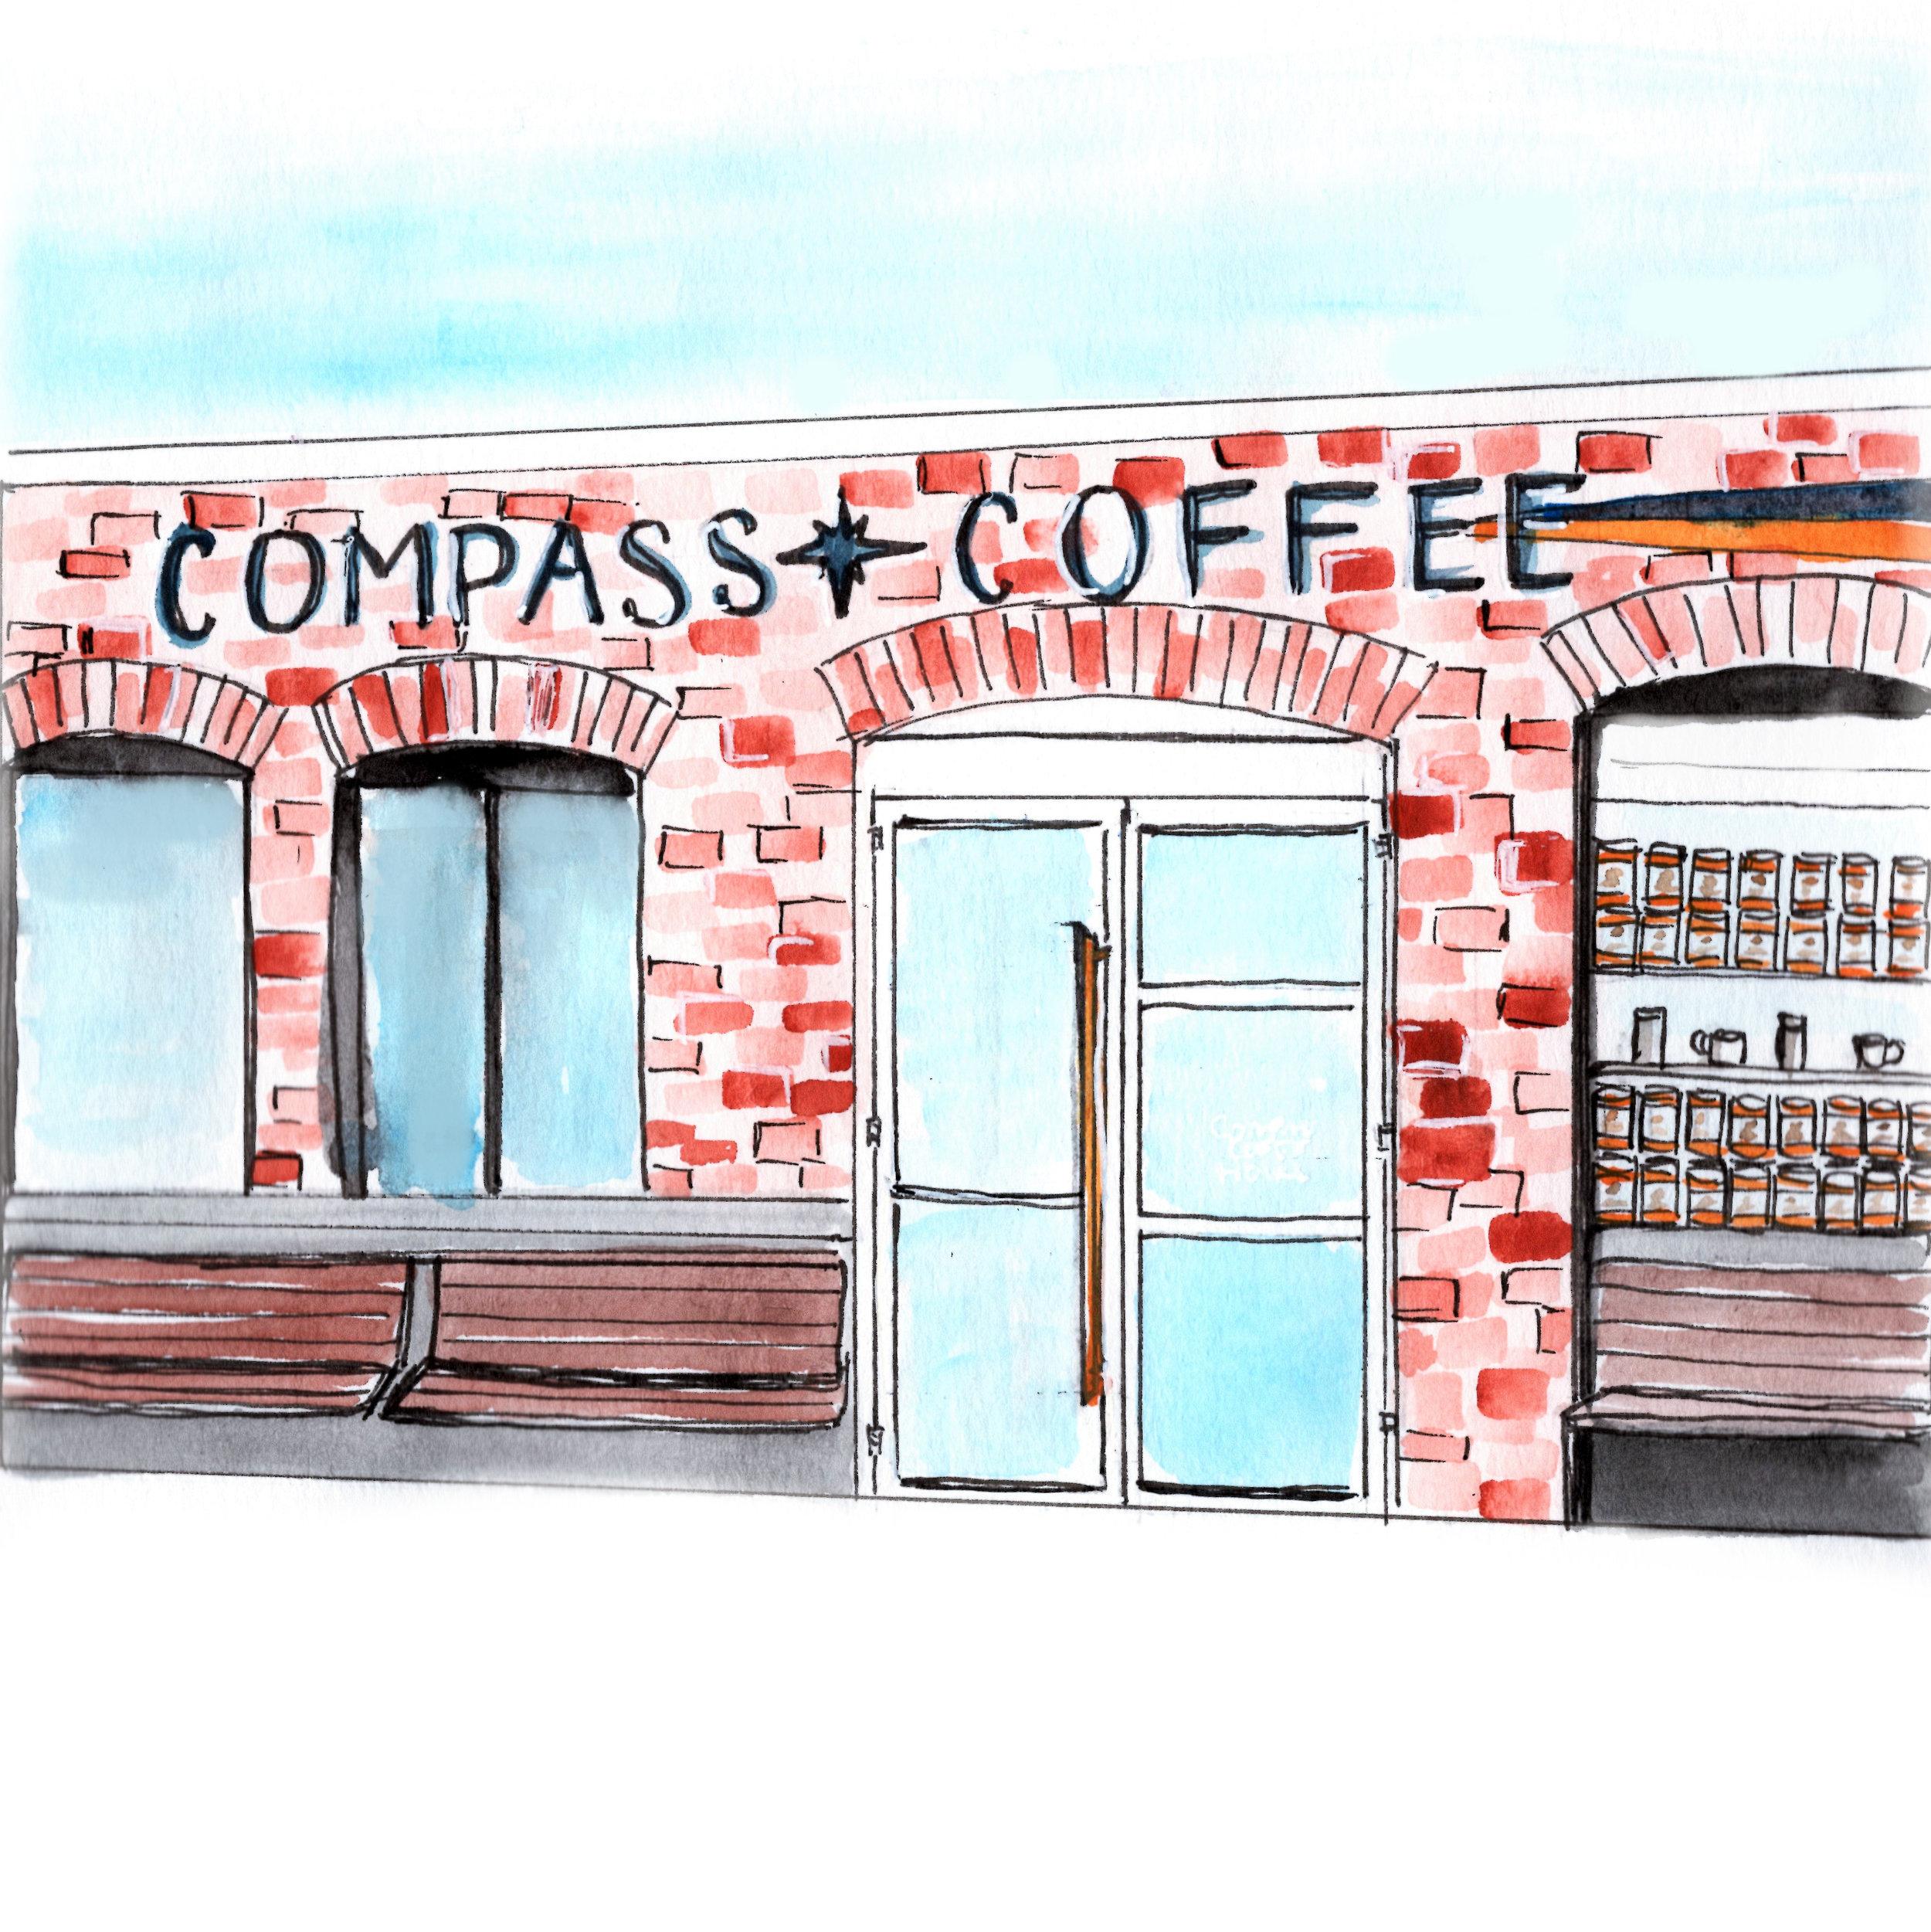 compasscoffee-7th street.jpg